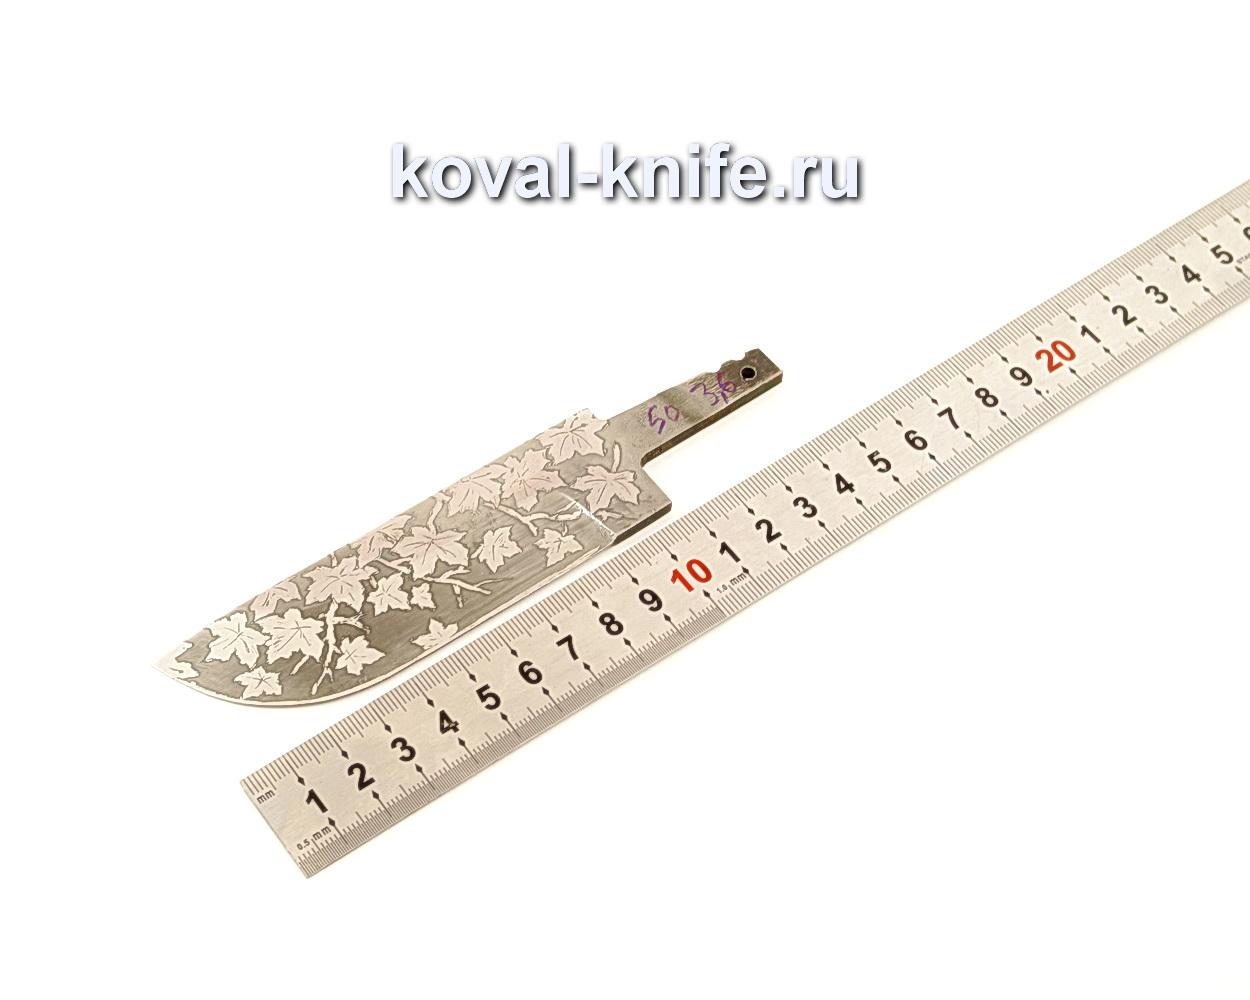 Клинок для ножа из кованой 95Х18 N50